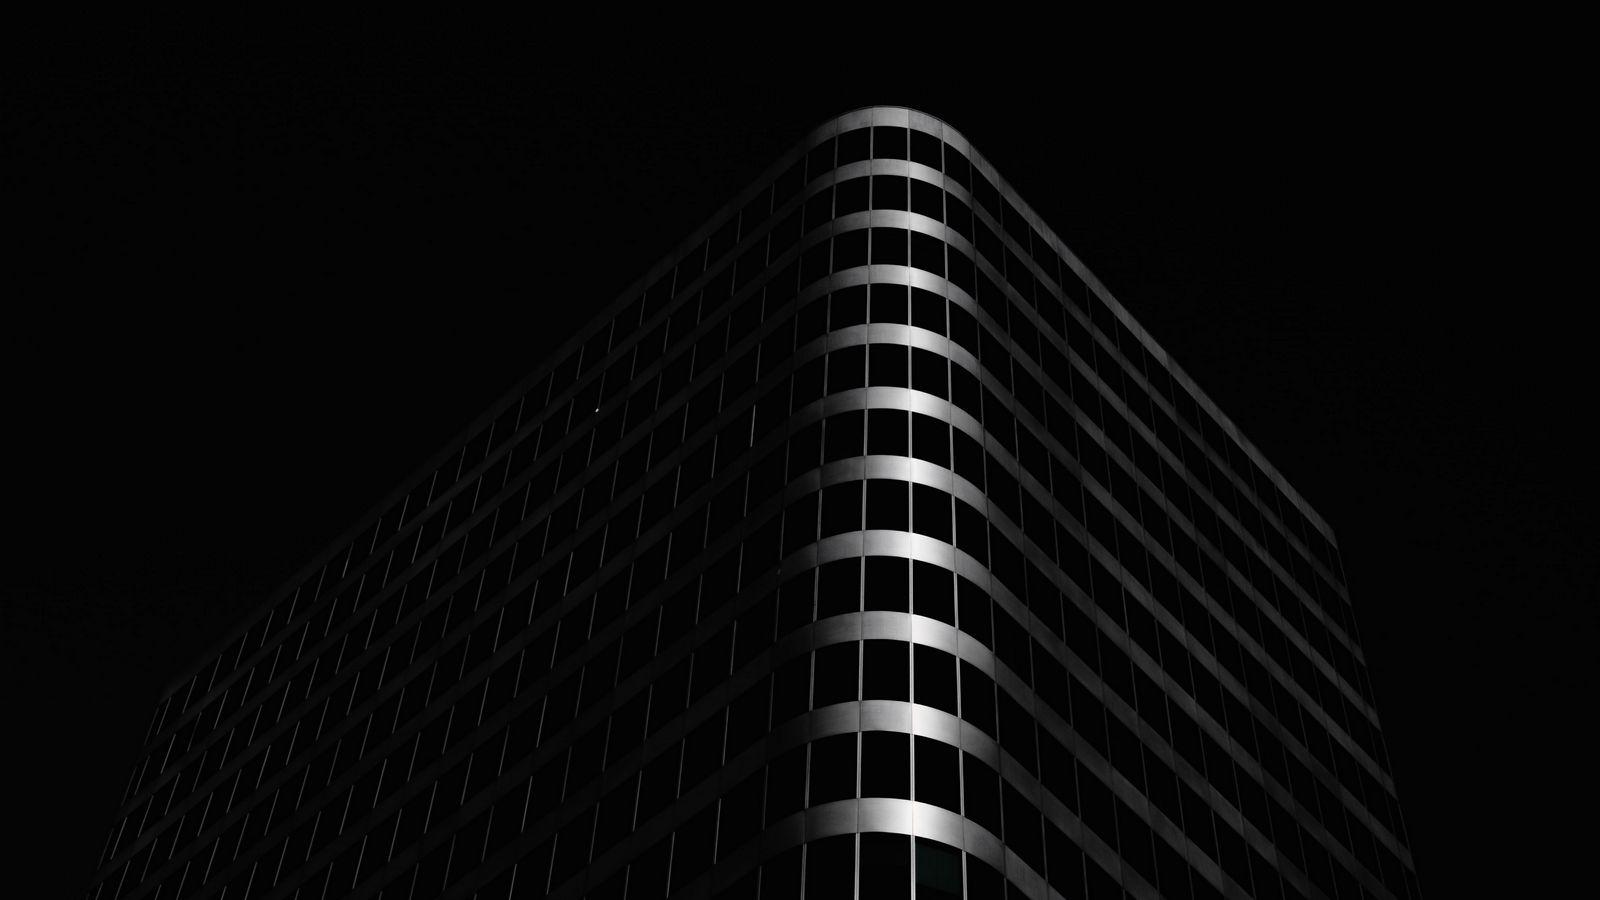 1600x900 Wallpaper building, architecture, black, dark